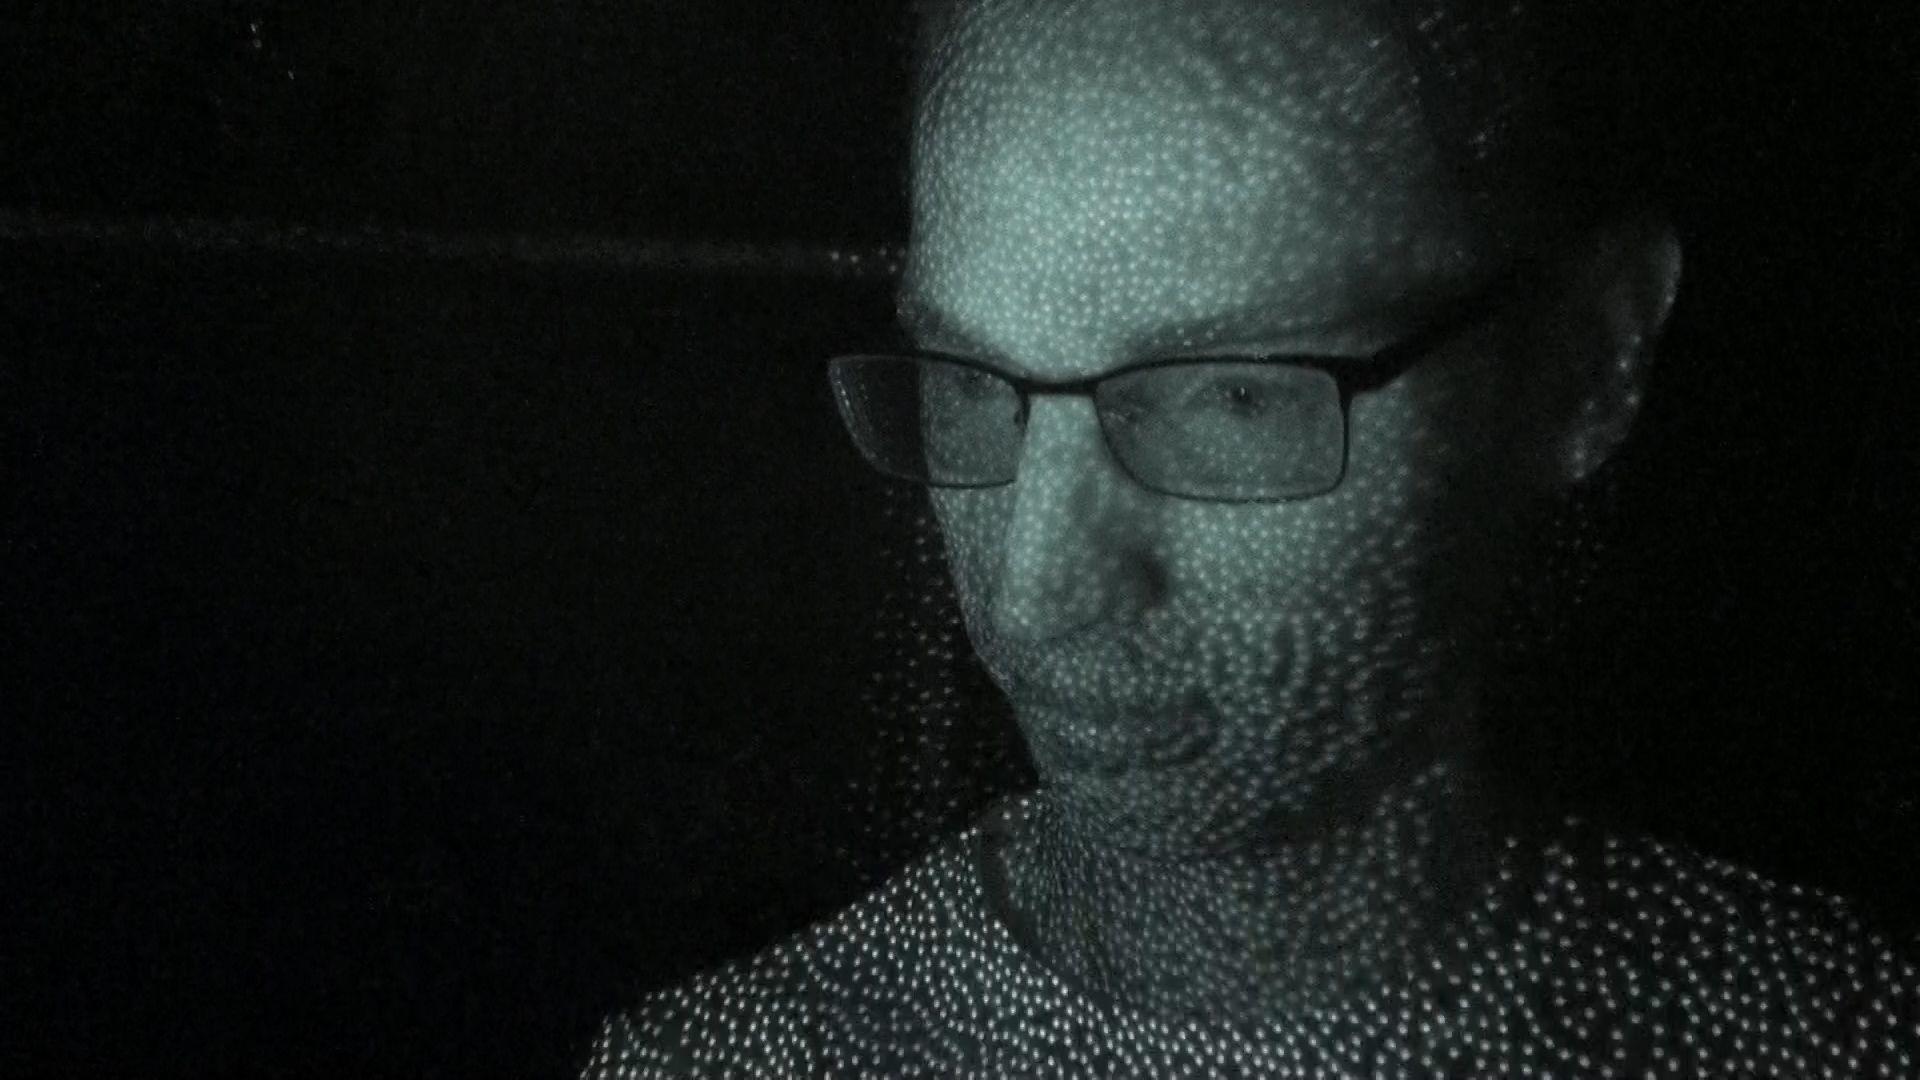 Apple iPhone X - Face ID infraroodbeeld